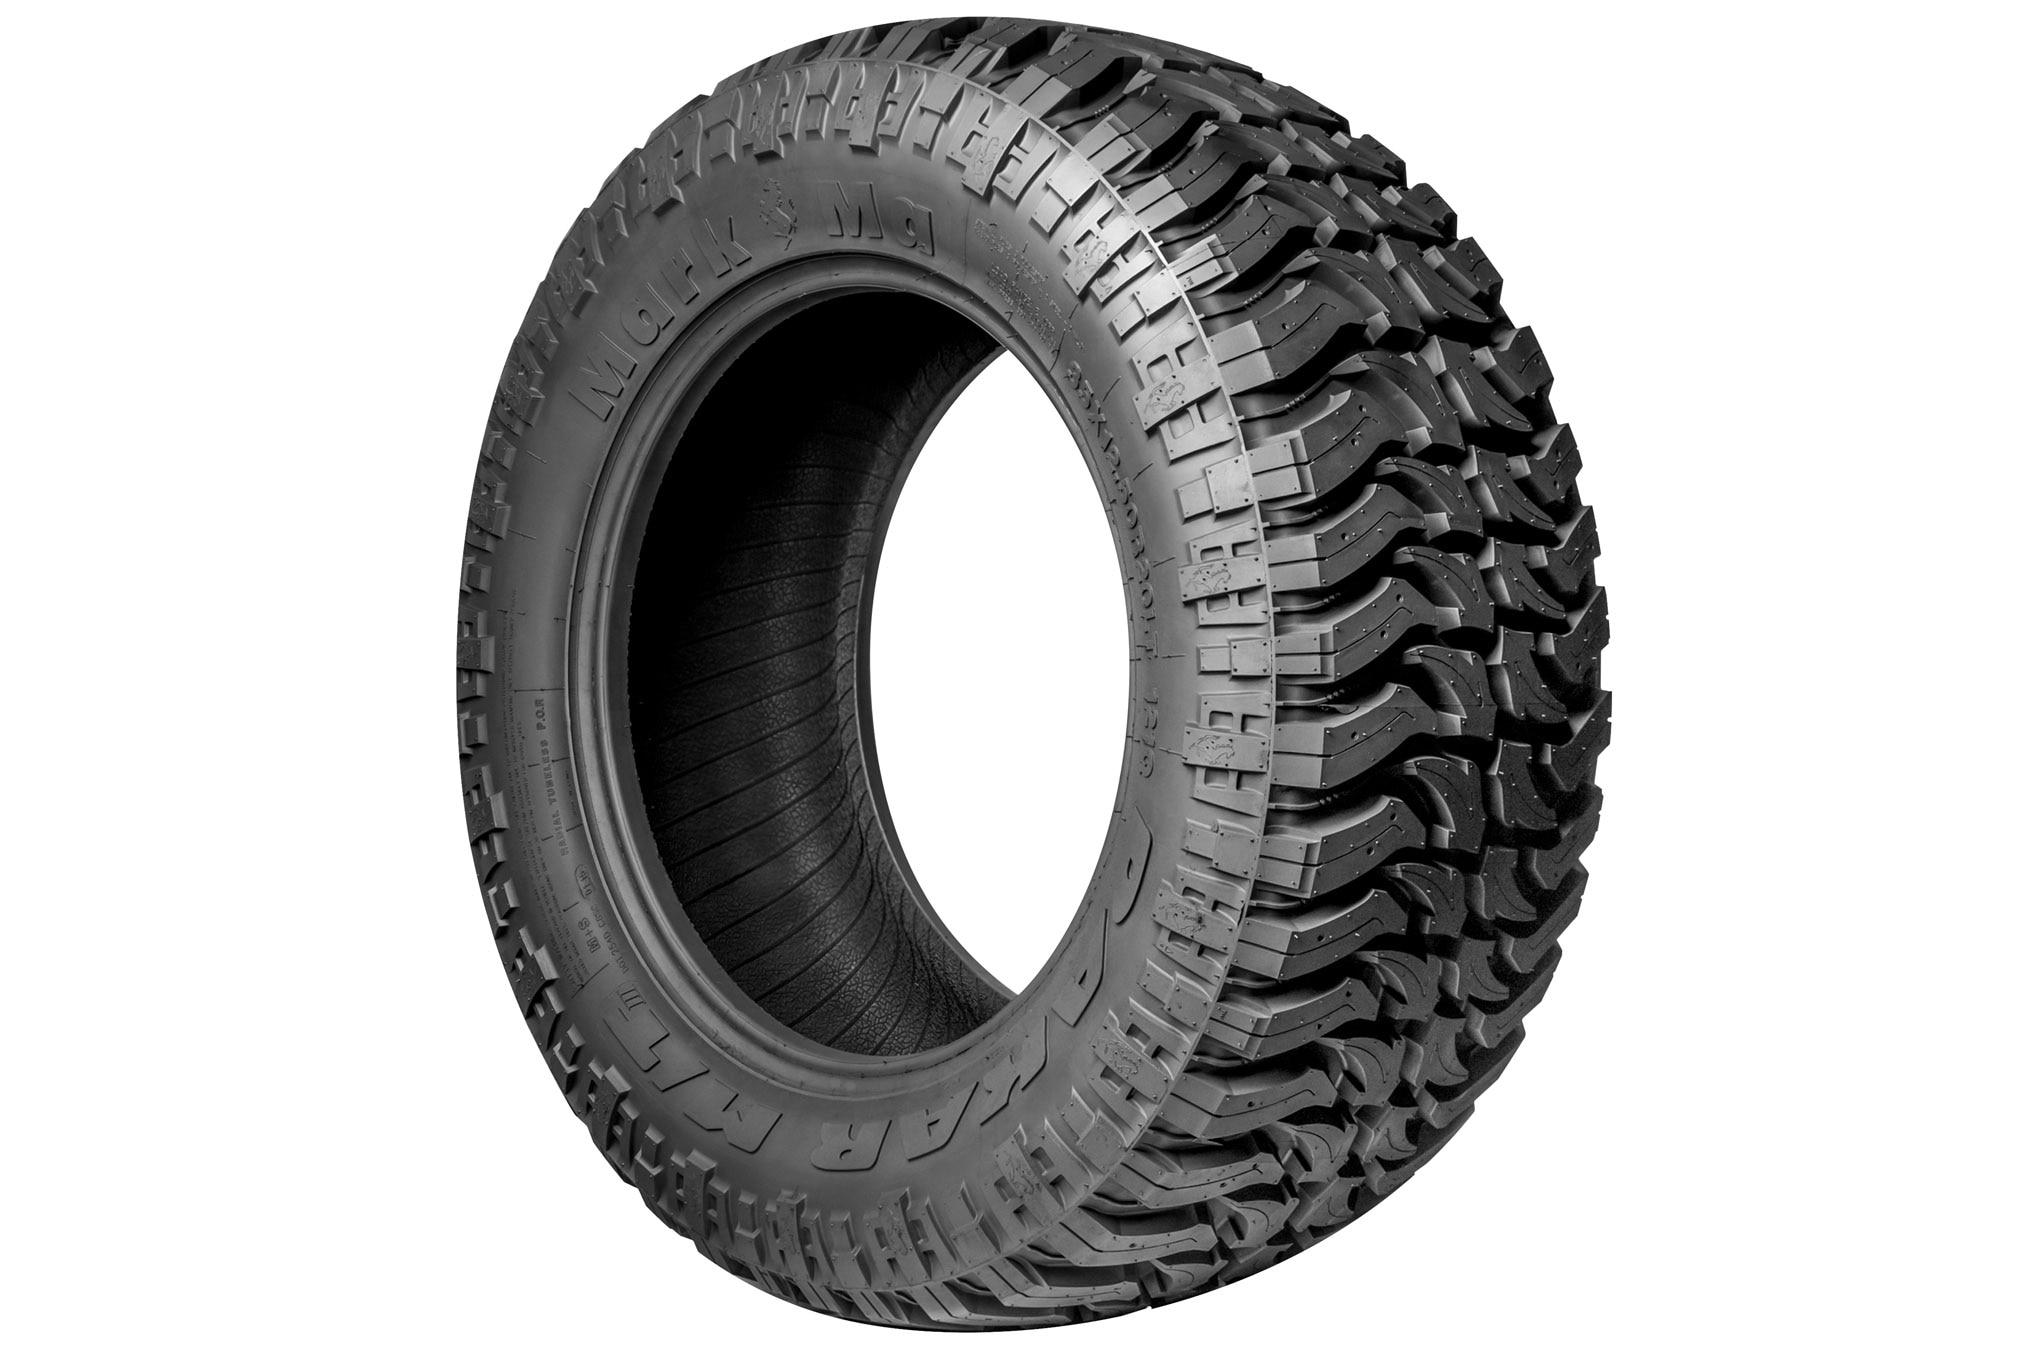 024 new tires tri ace mark ma iii